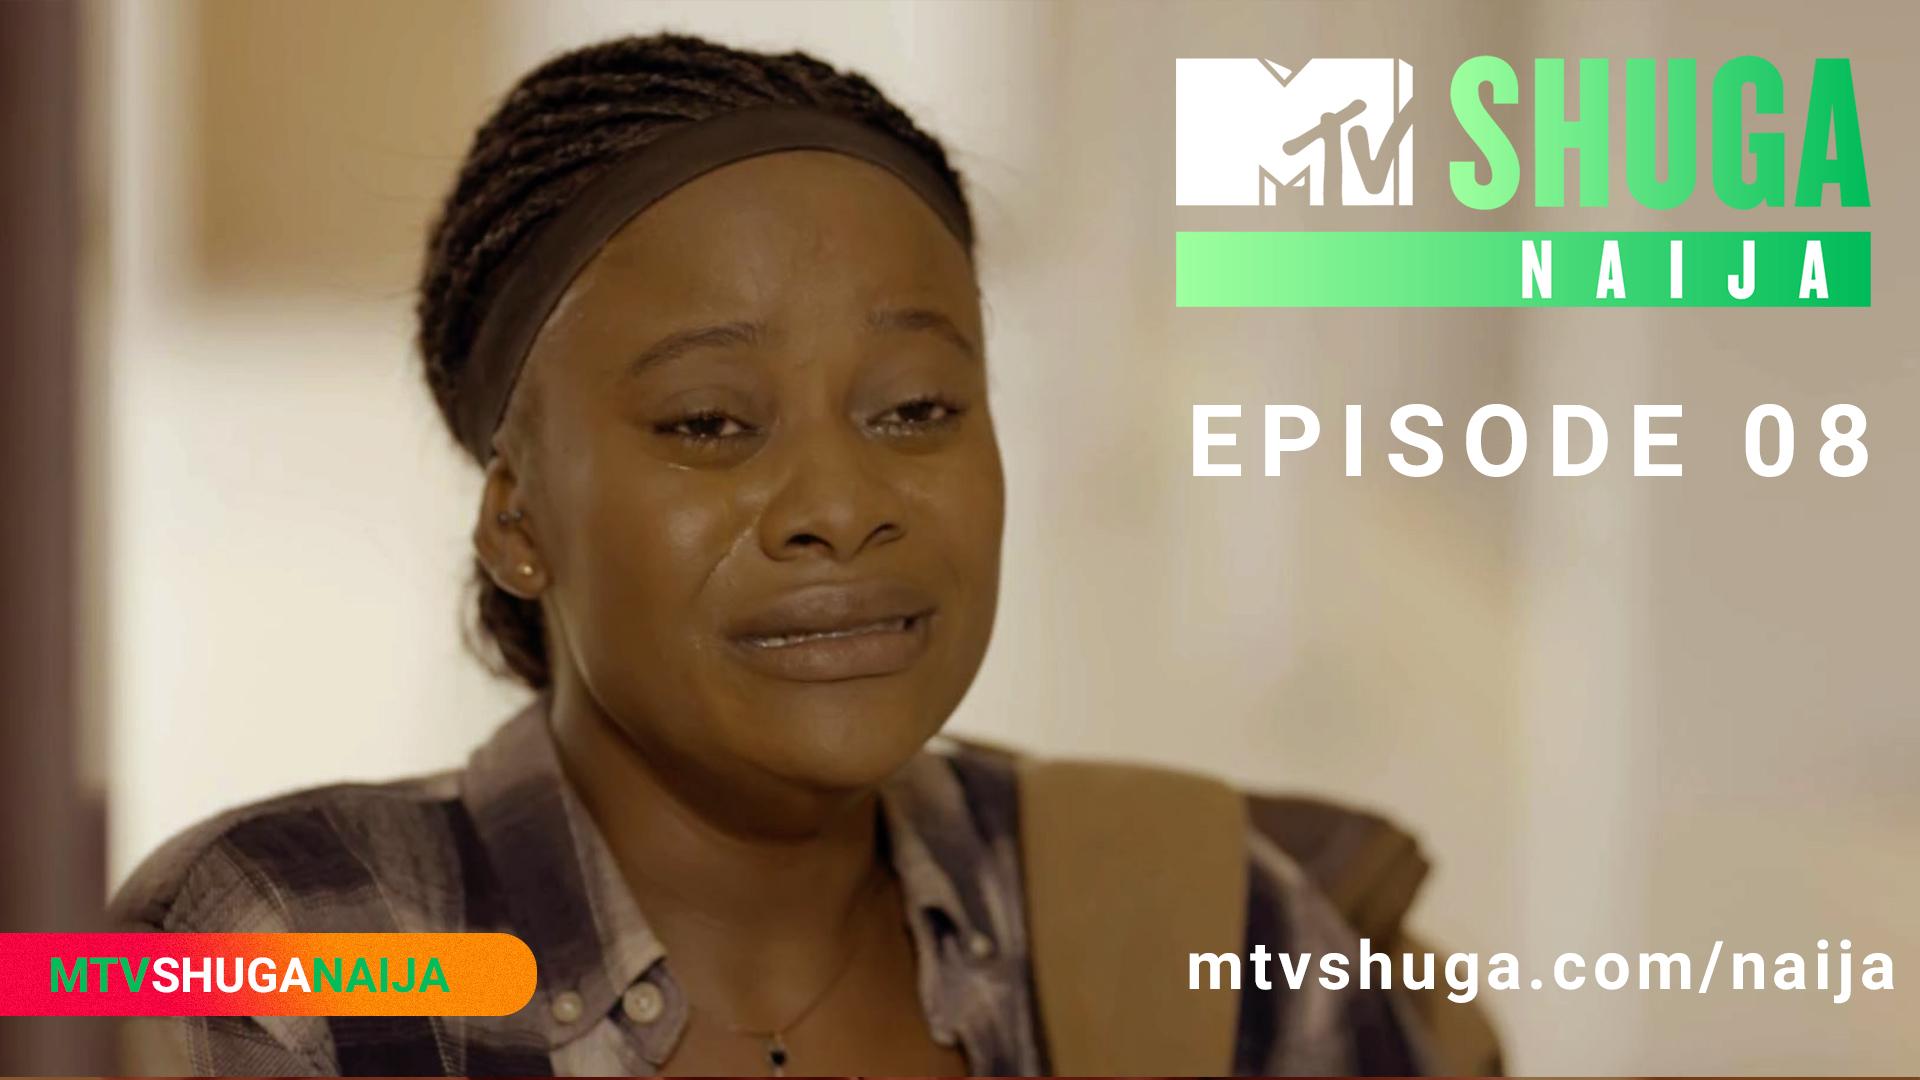 Review: MTV Shuga Naija Season 4 Flings Its Characters Into An Insane Array of Emotions. And It's Lit.